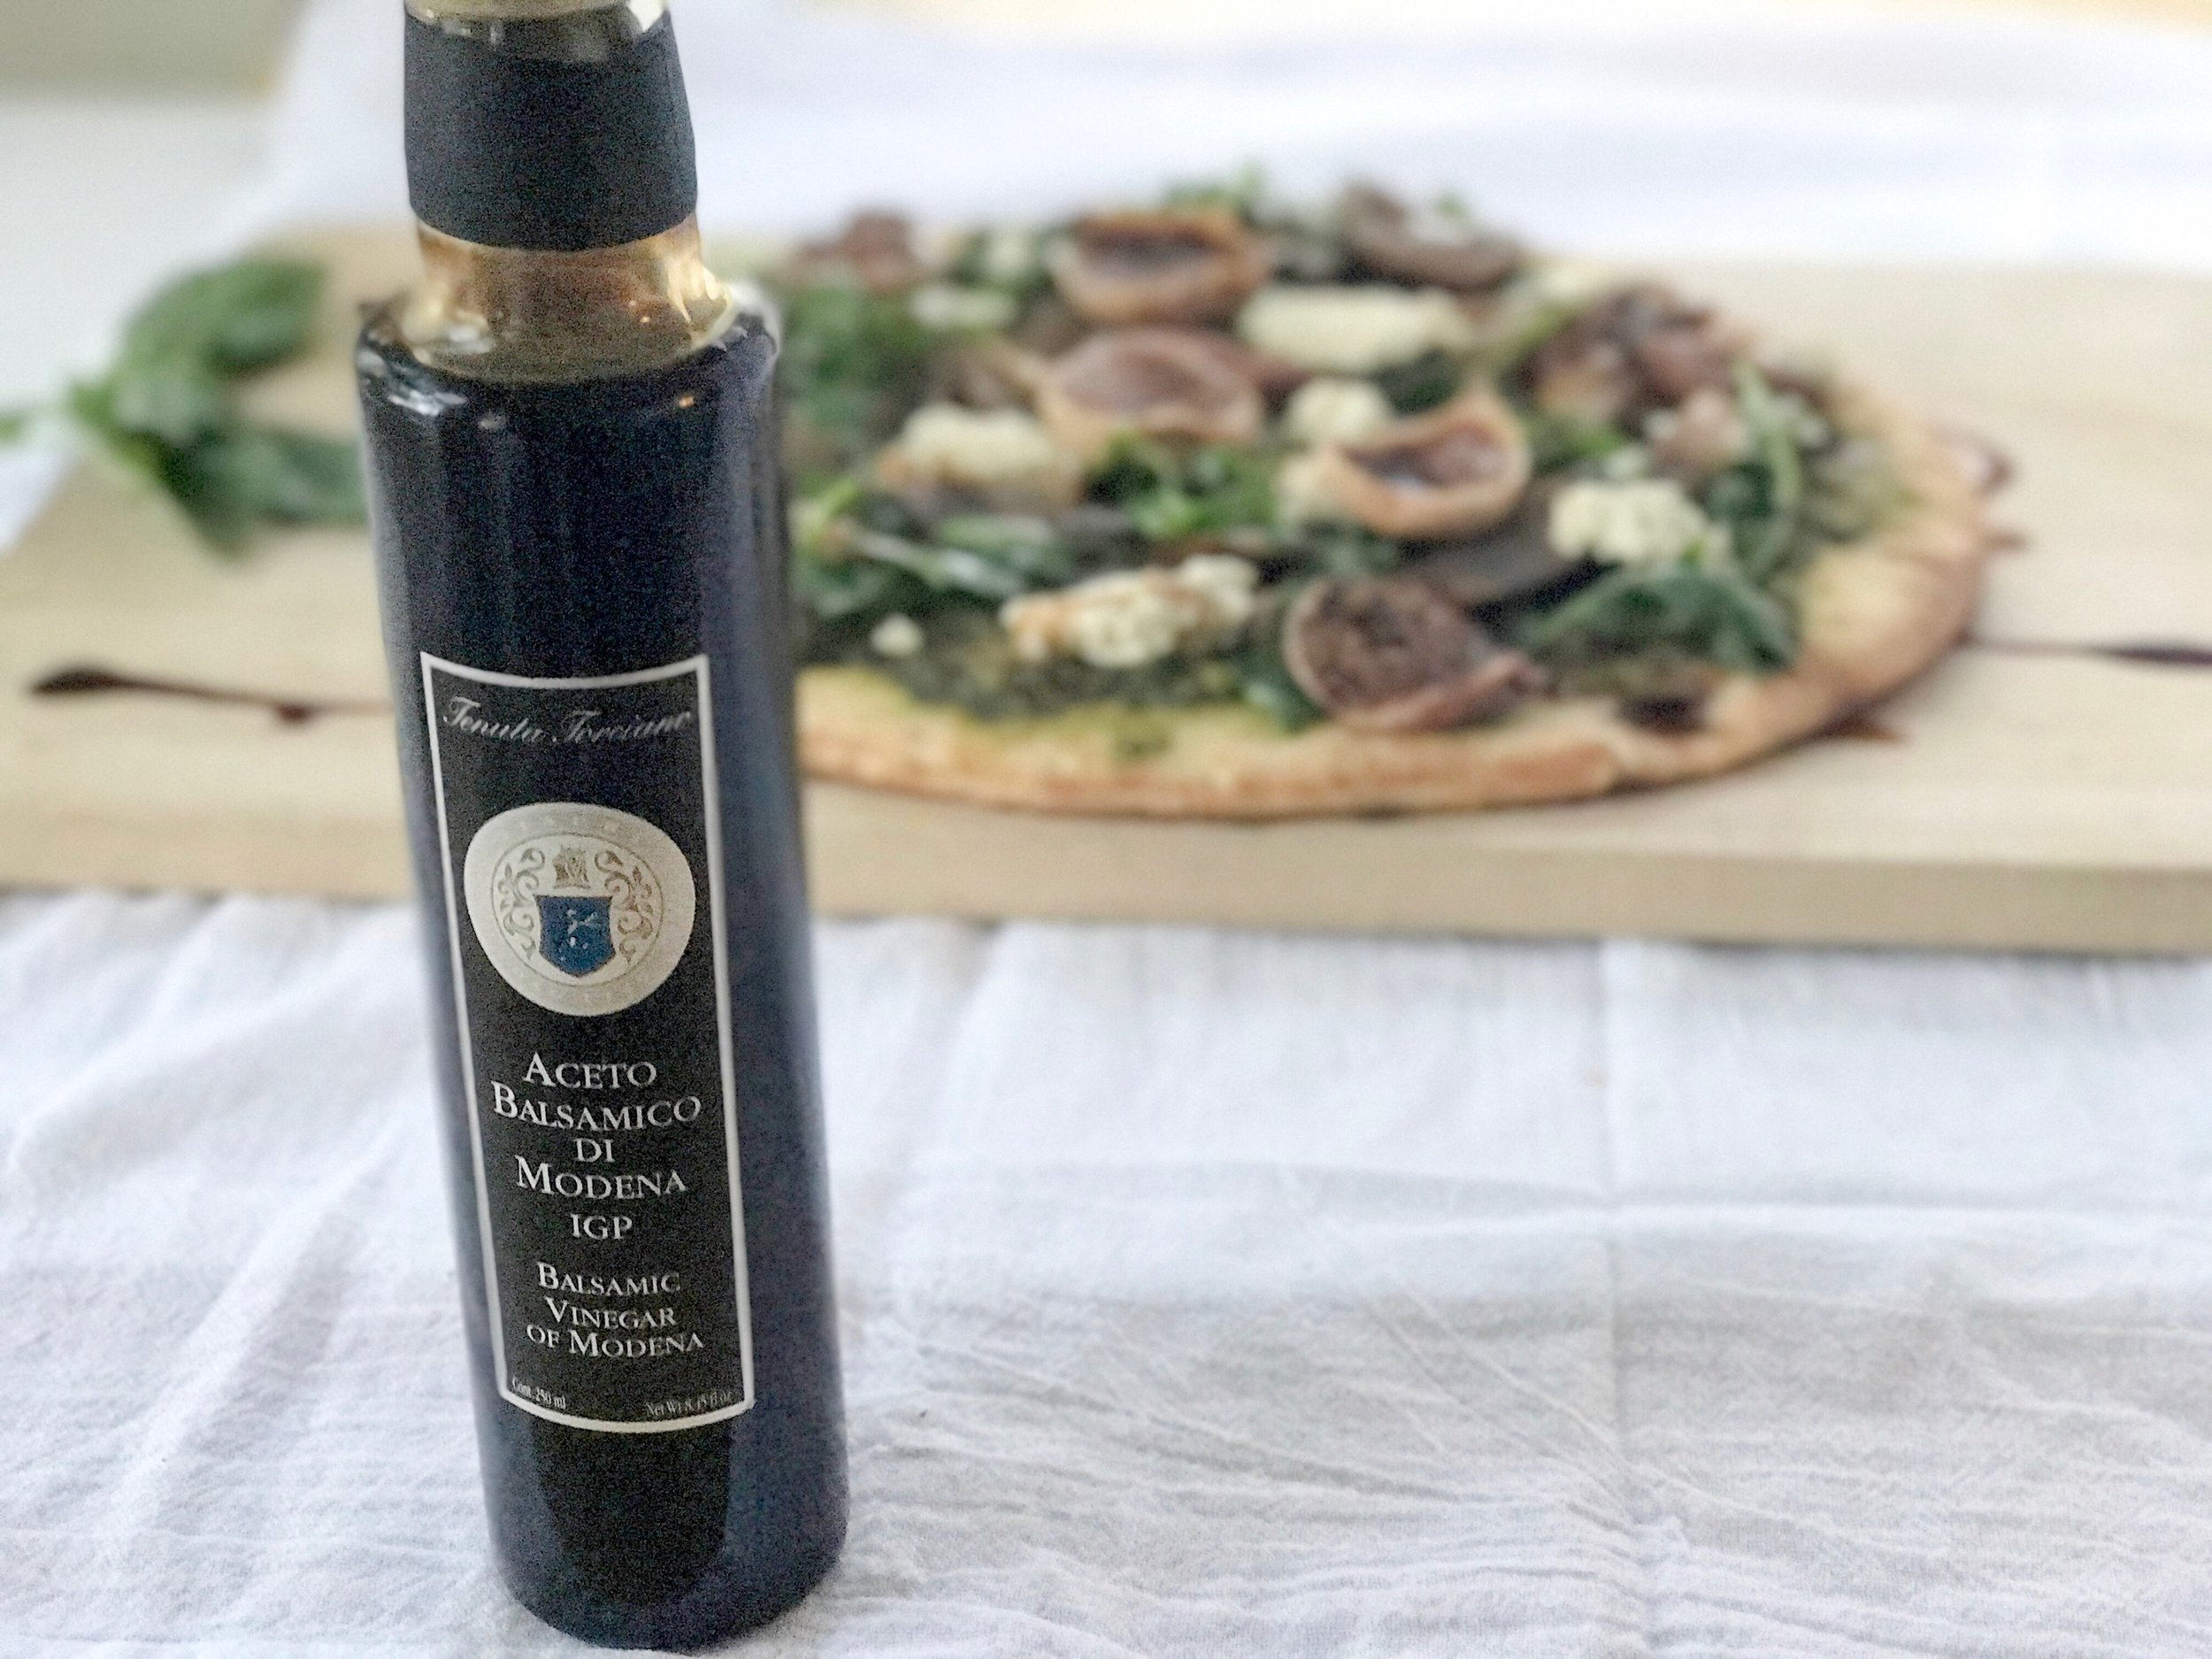 The Italian balsamic all its glory.